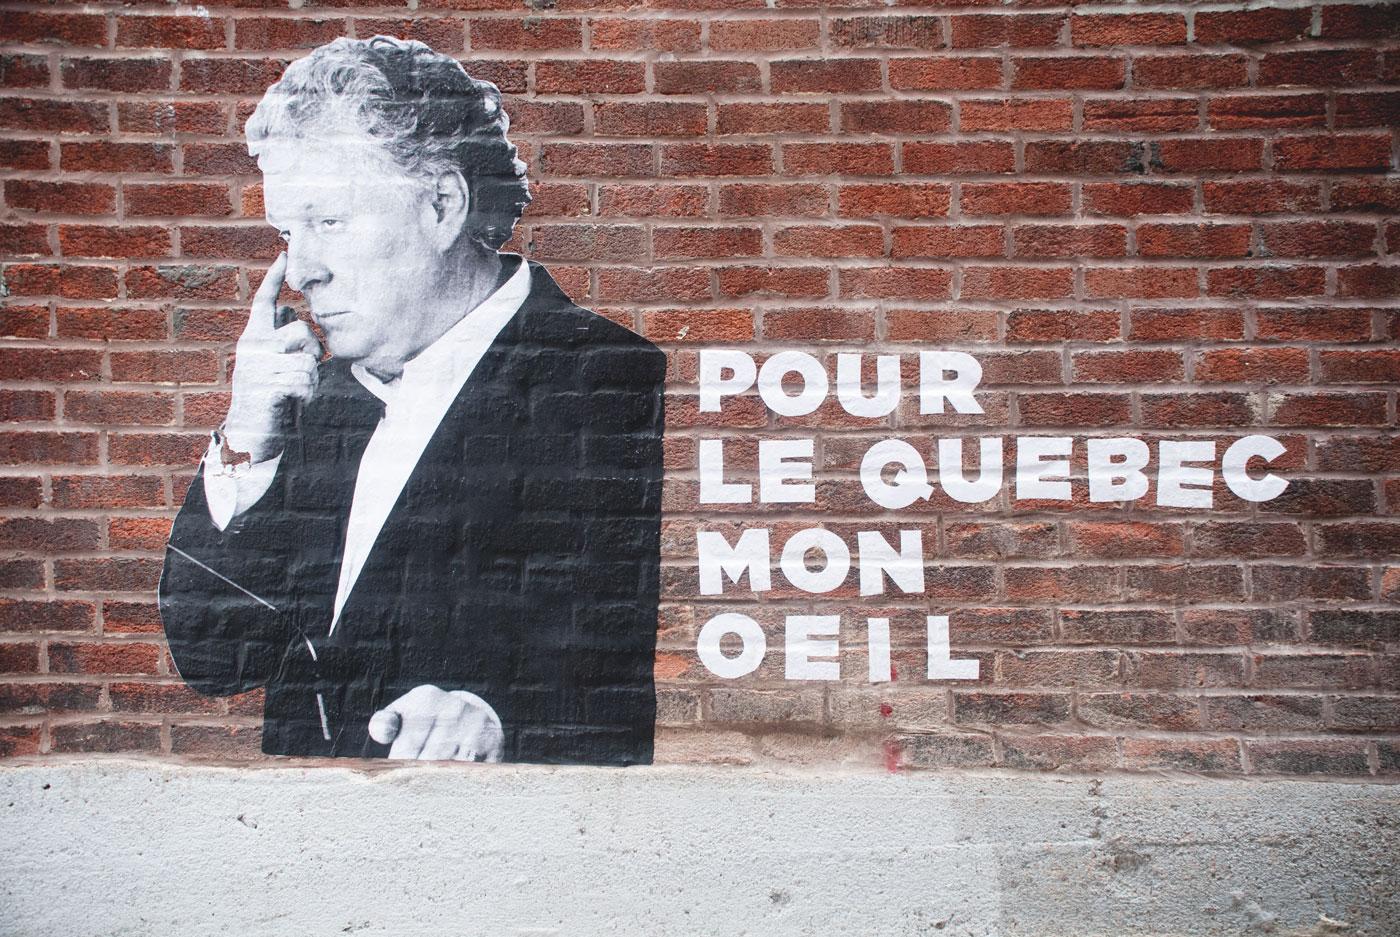 Jean Charest street art